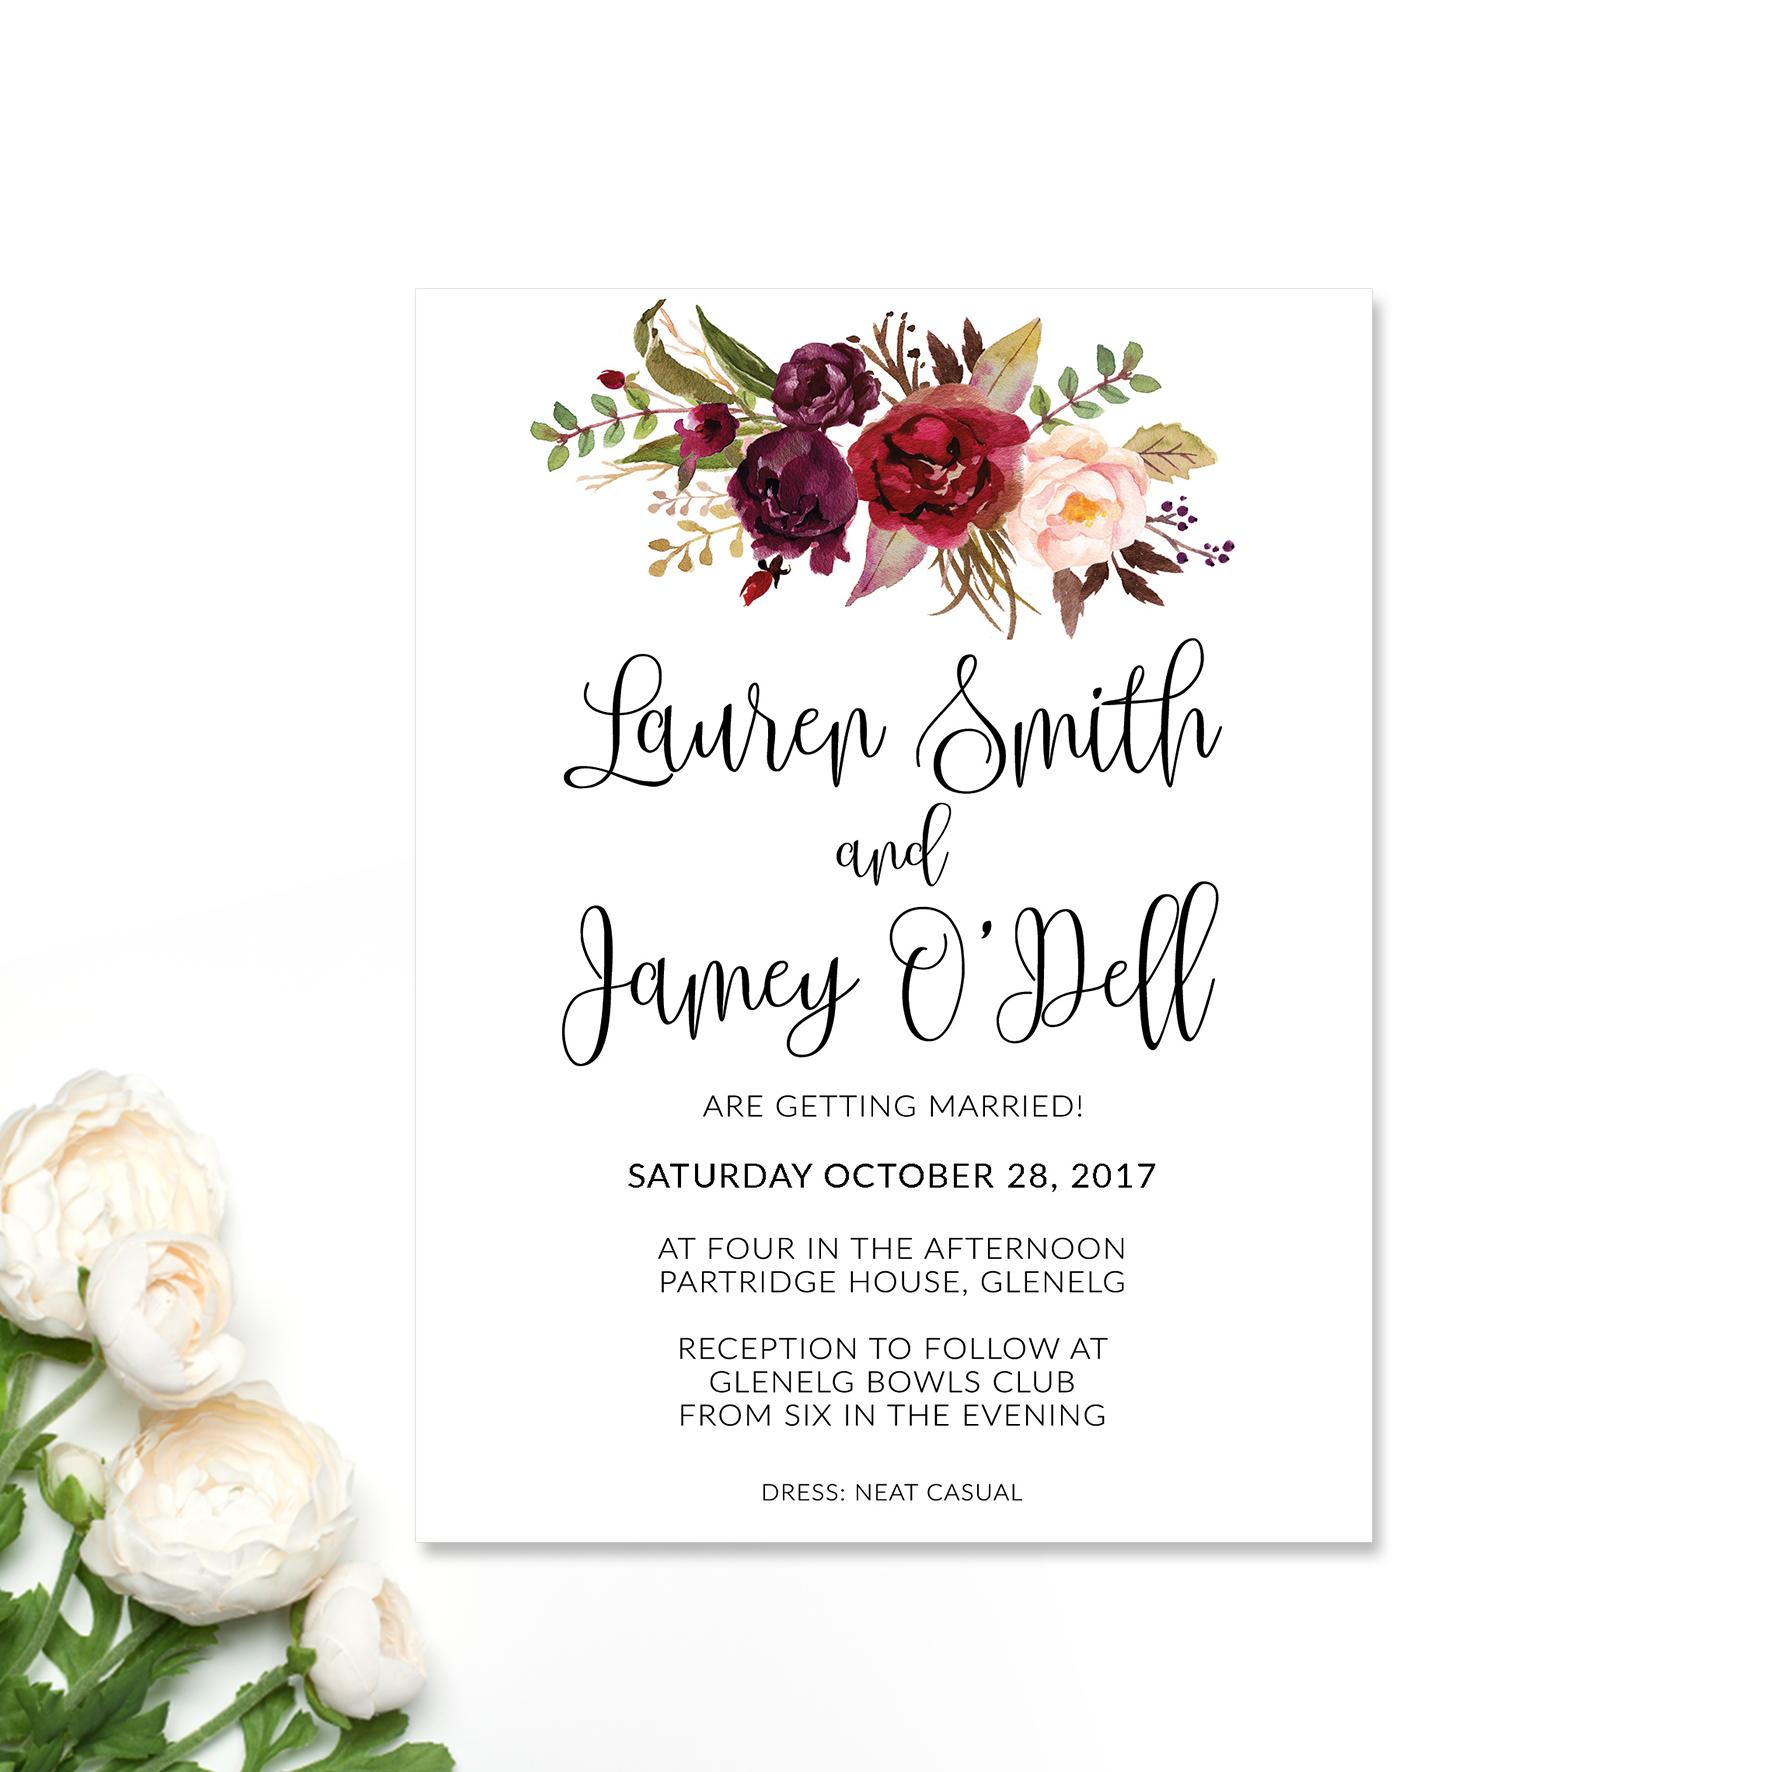 Paper Halo | Wedding & Event Invitations Australia